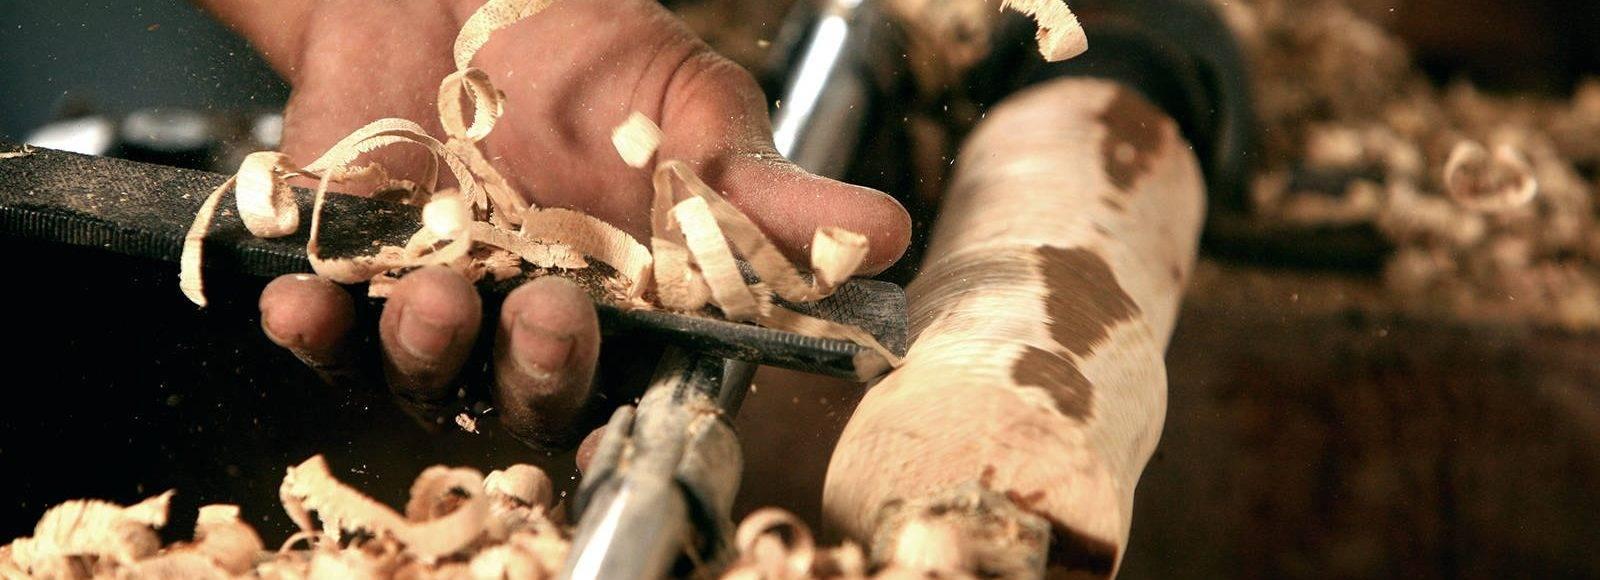 Donegal Pens Handmade Wooden Pens